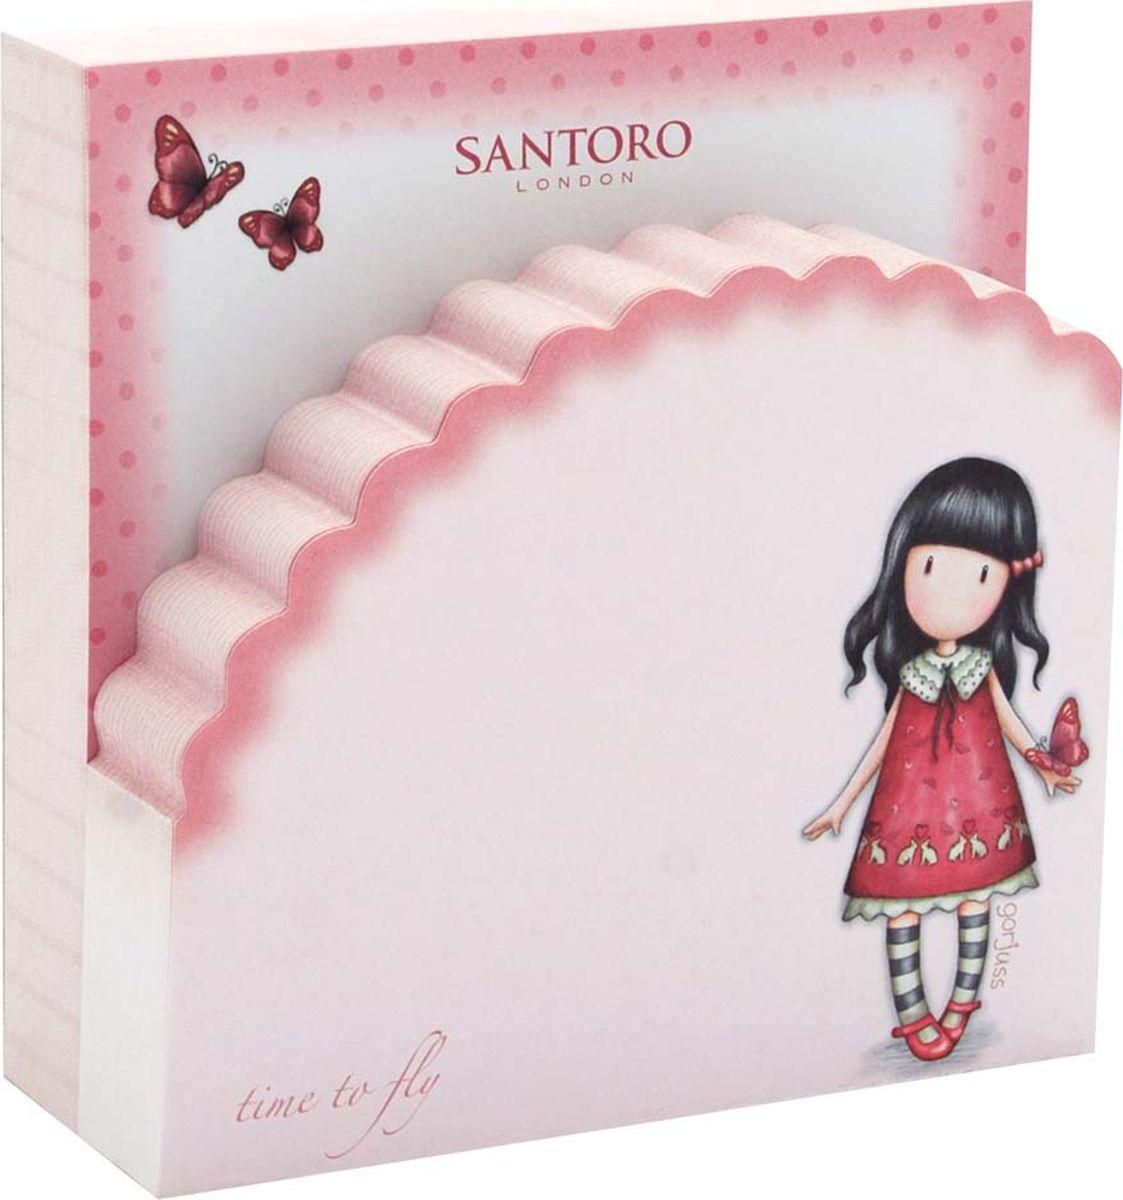 Santoro Бумага для заметок Time to Fly -  Бумага для заметок, стикеры, закладки